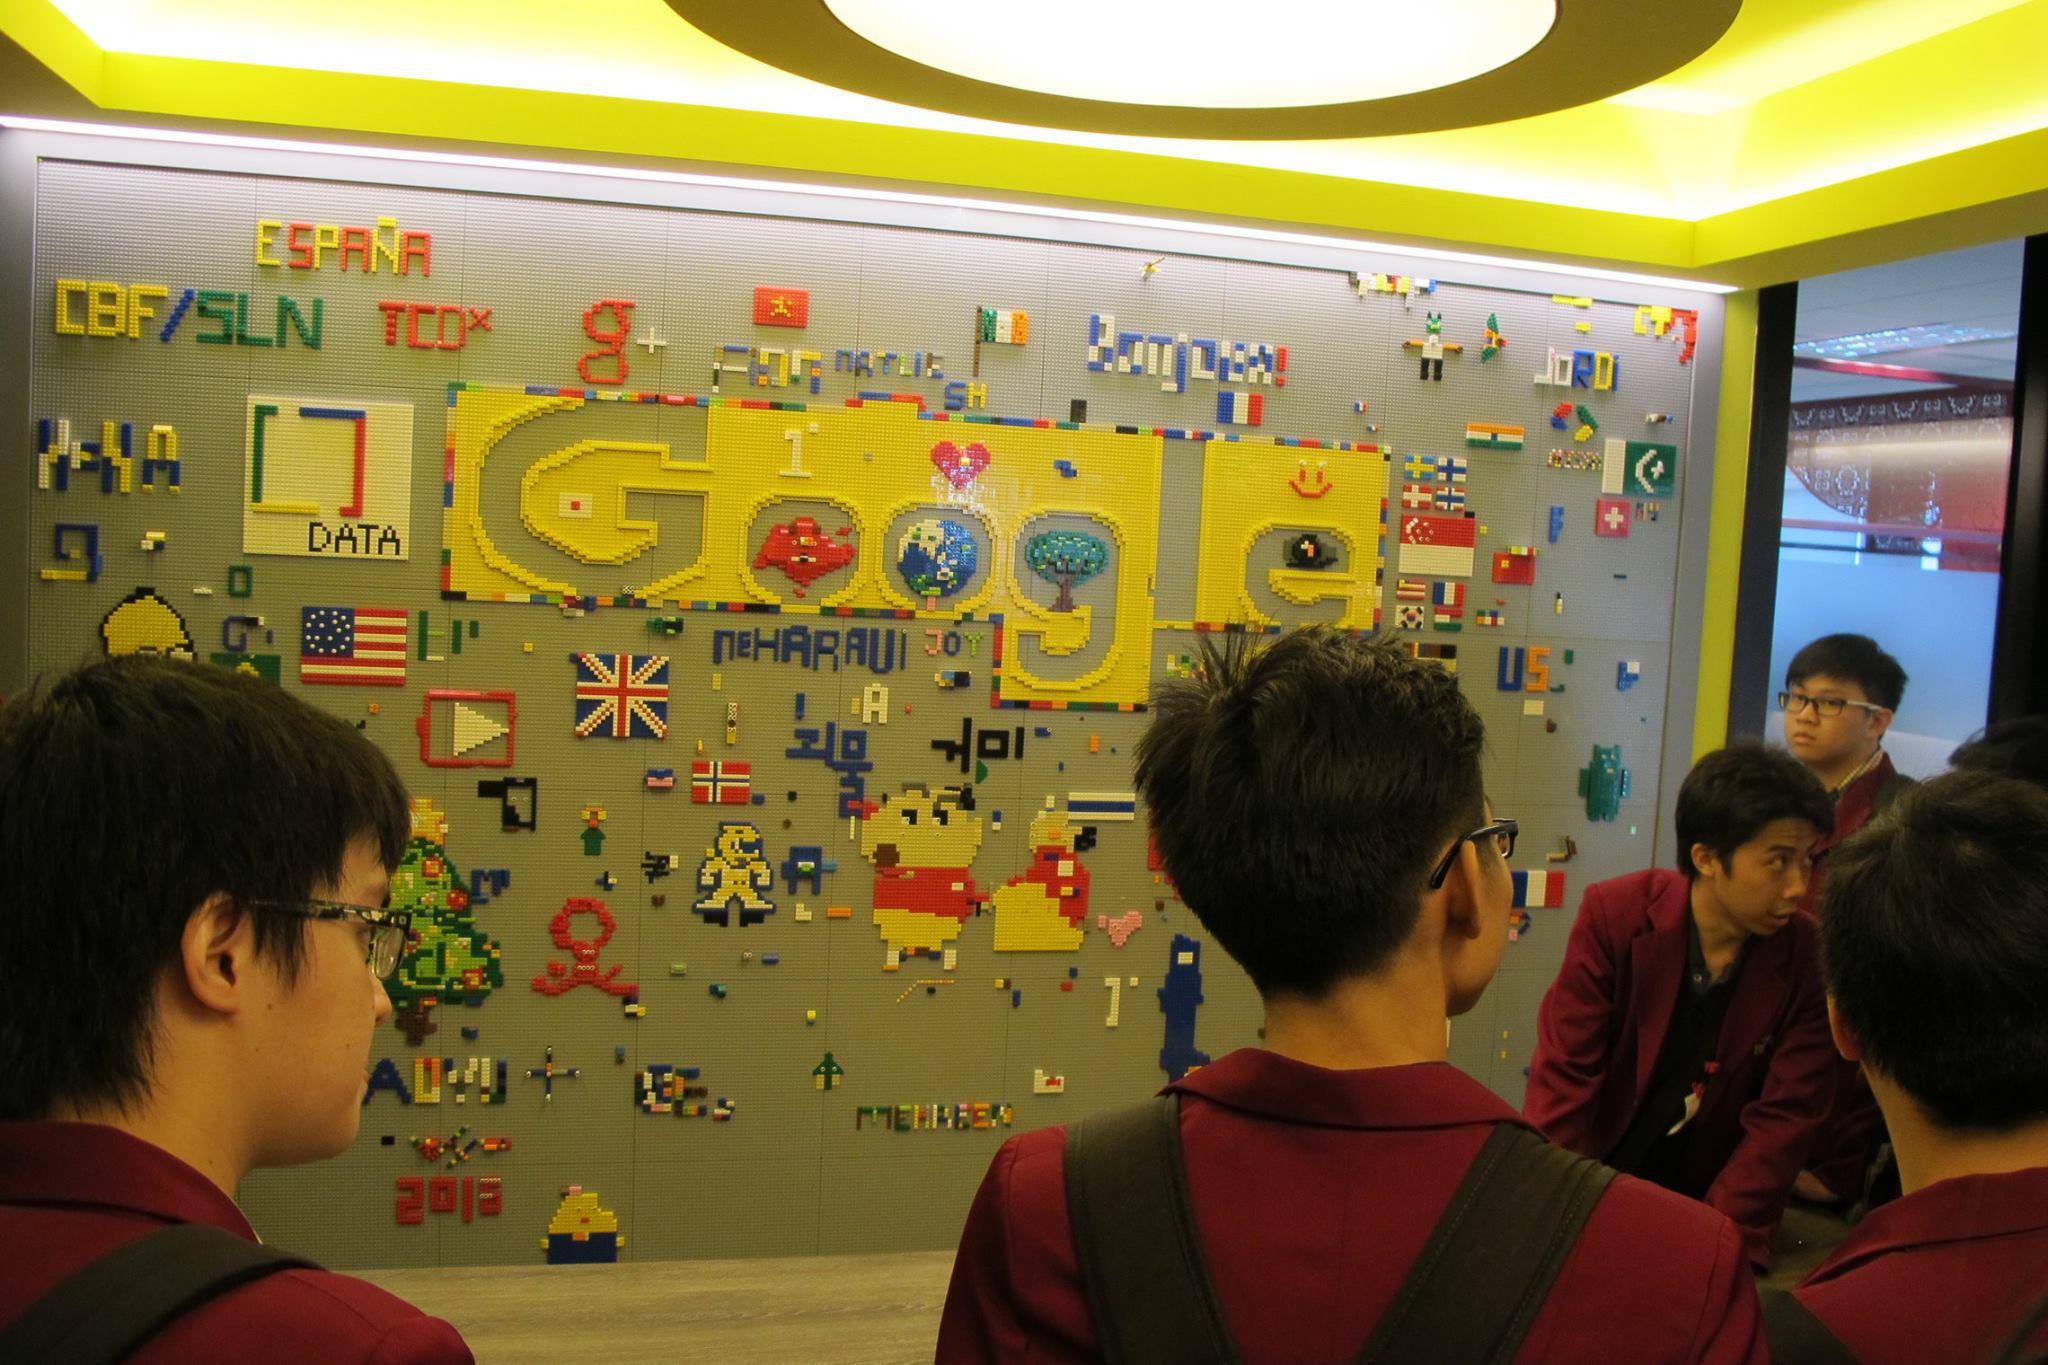 Suasana Lego Room di Google Singapore